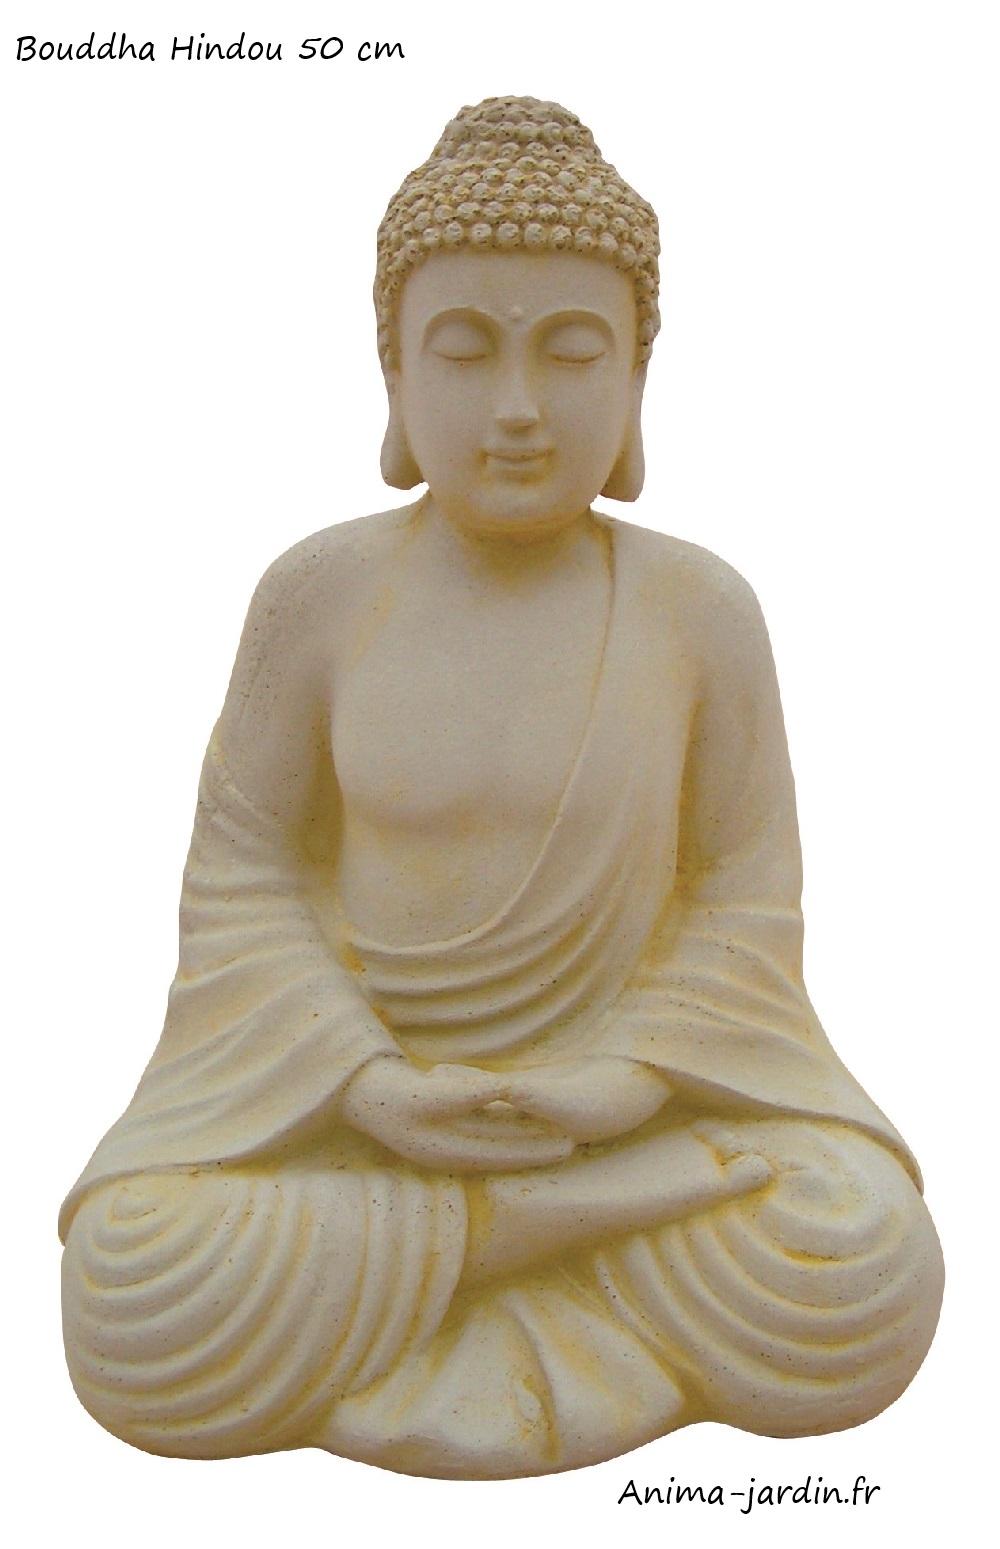 bouddha-en-pierre-50-cm